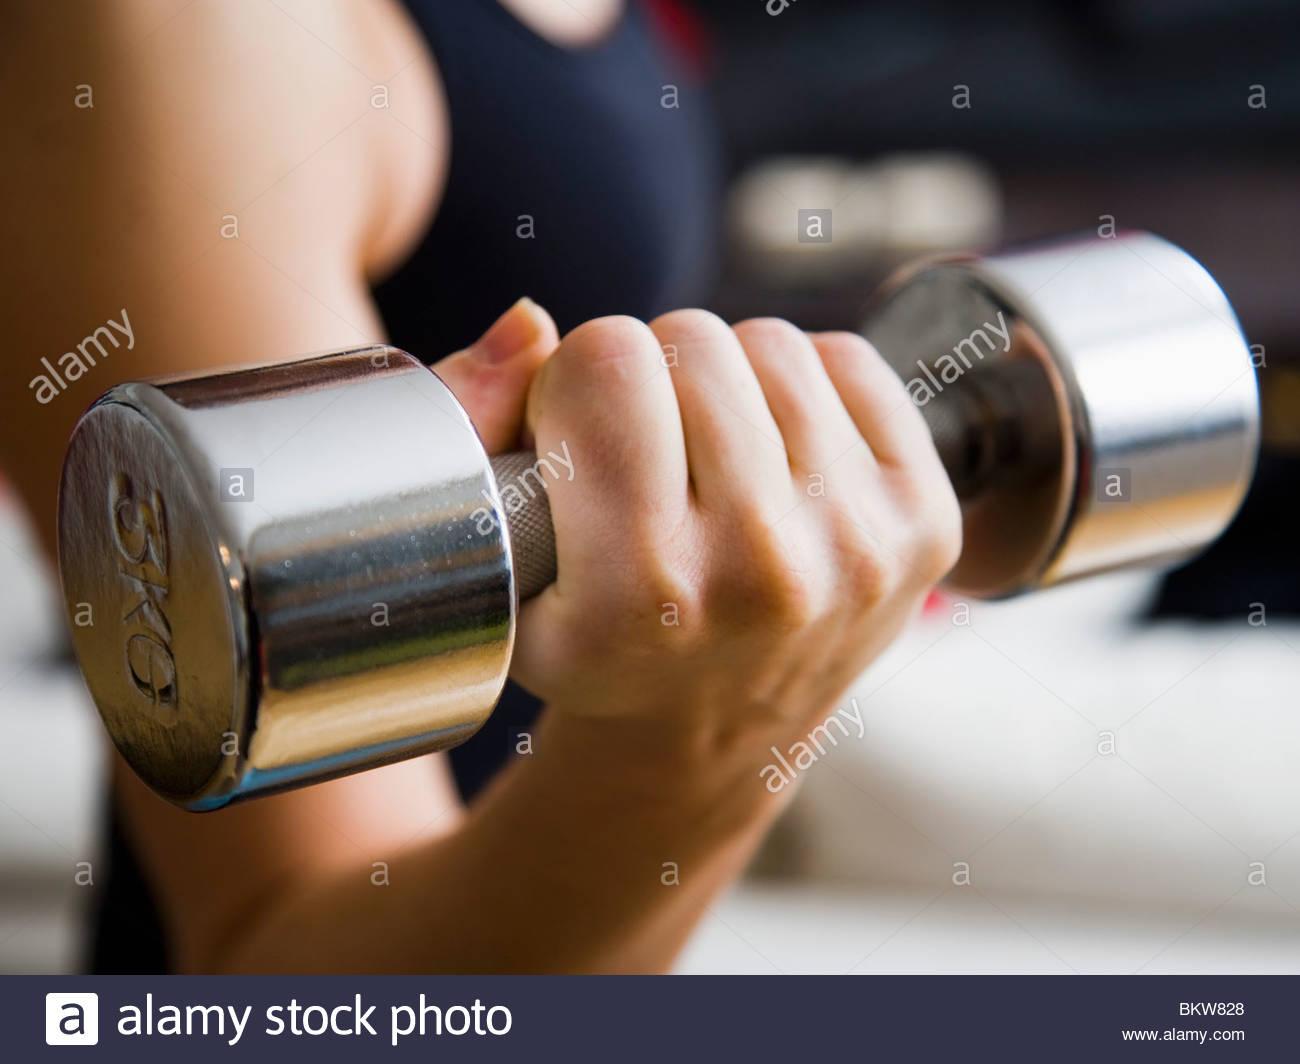 Trainieren Sie im Fitness-Studio Stockbild